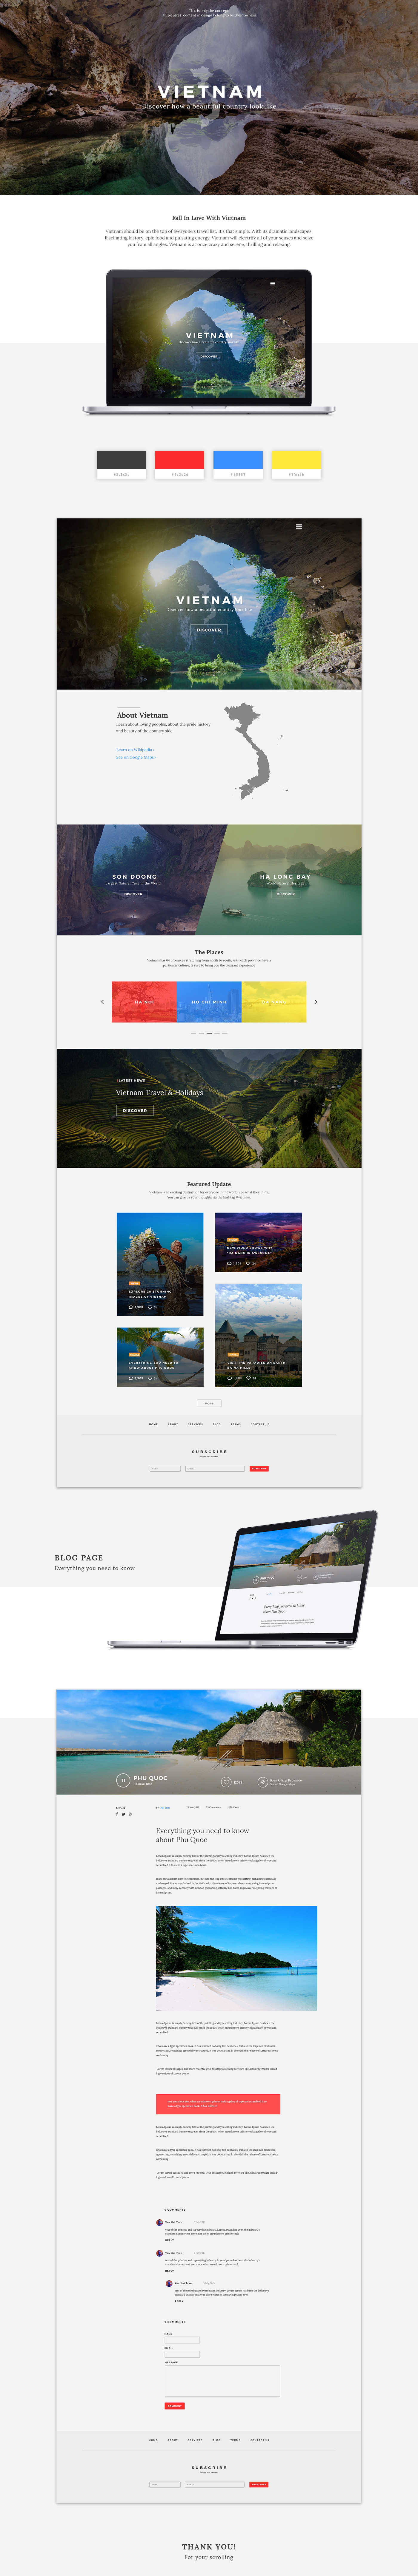 Vietnam Travel Discovery Vietnam Website Art Directon UI/UX Design